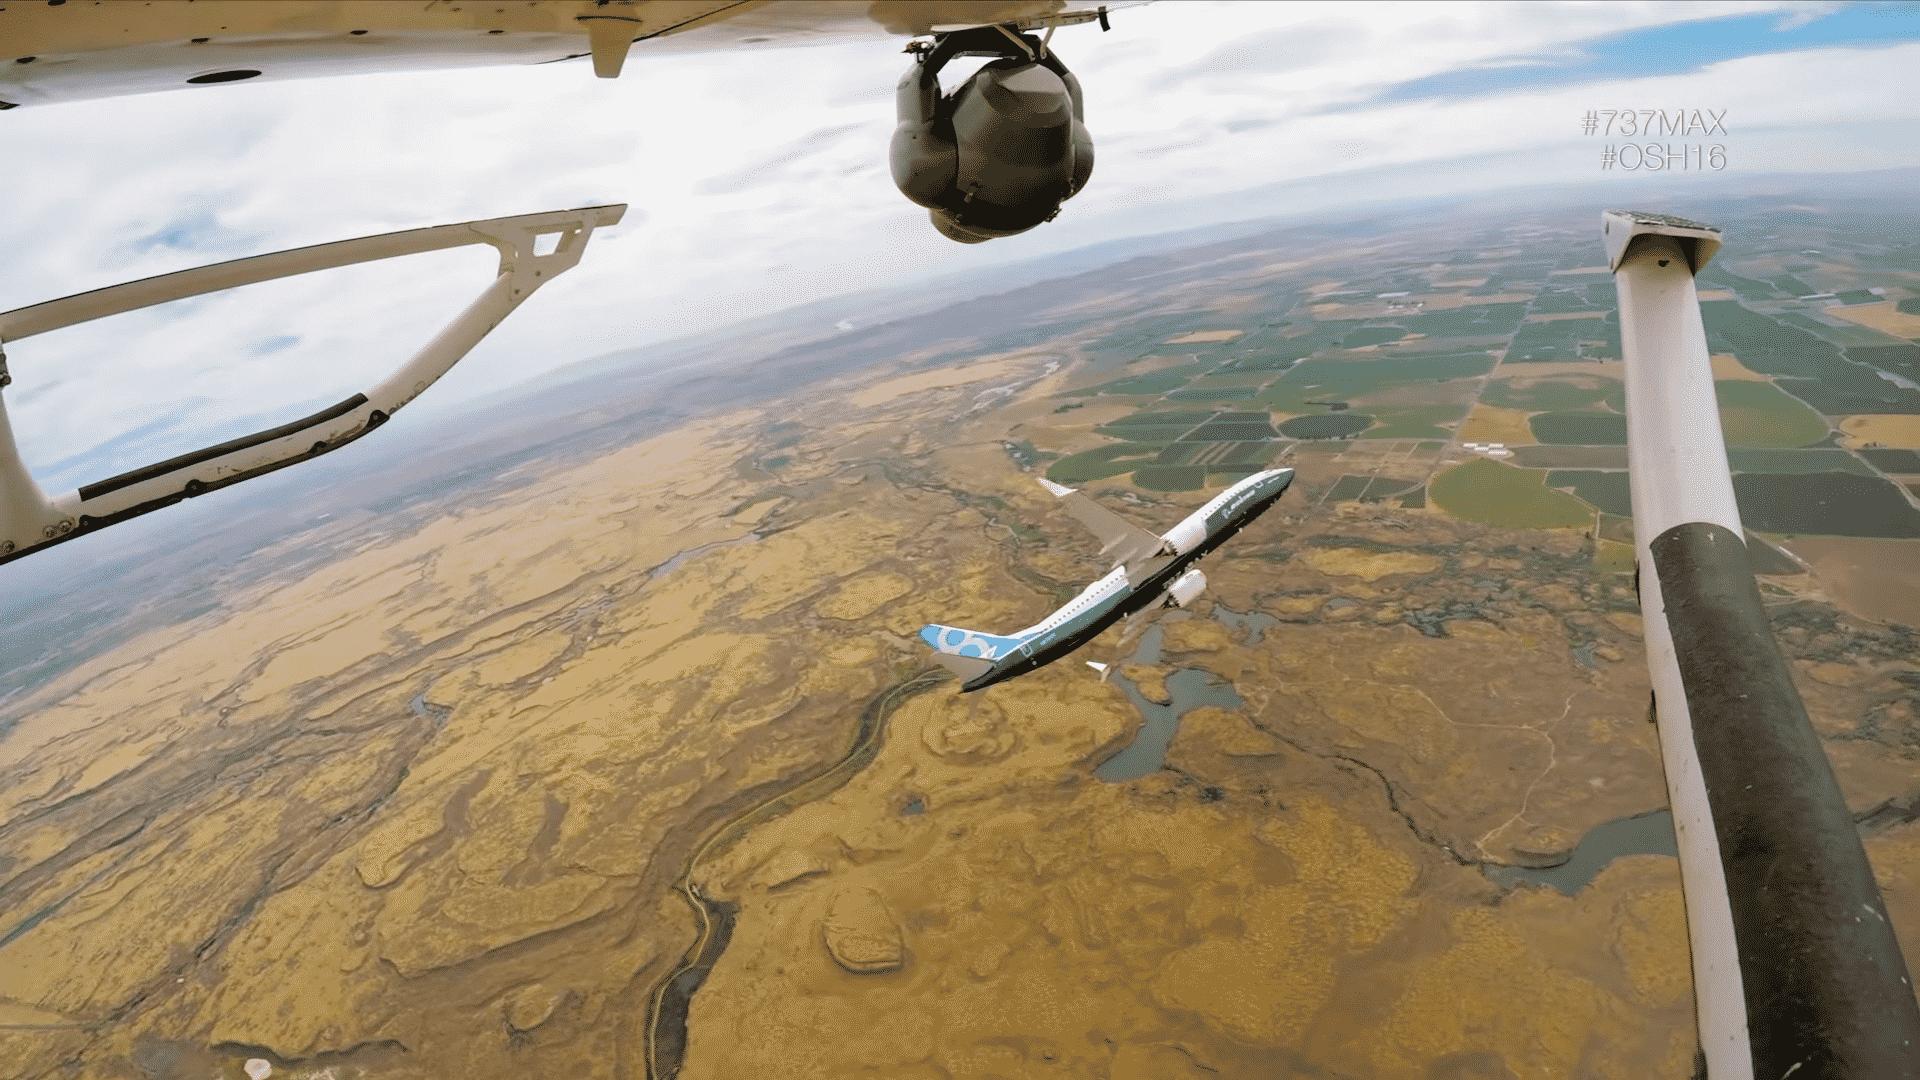 Boeing-737-MAX-OSH16